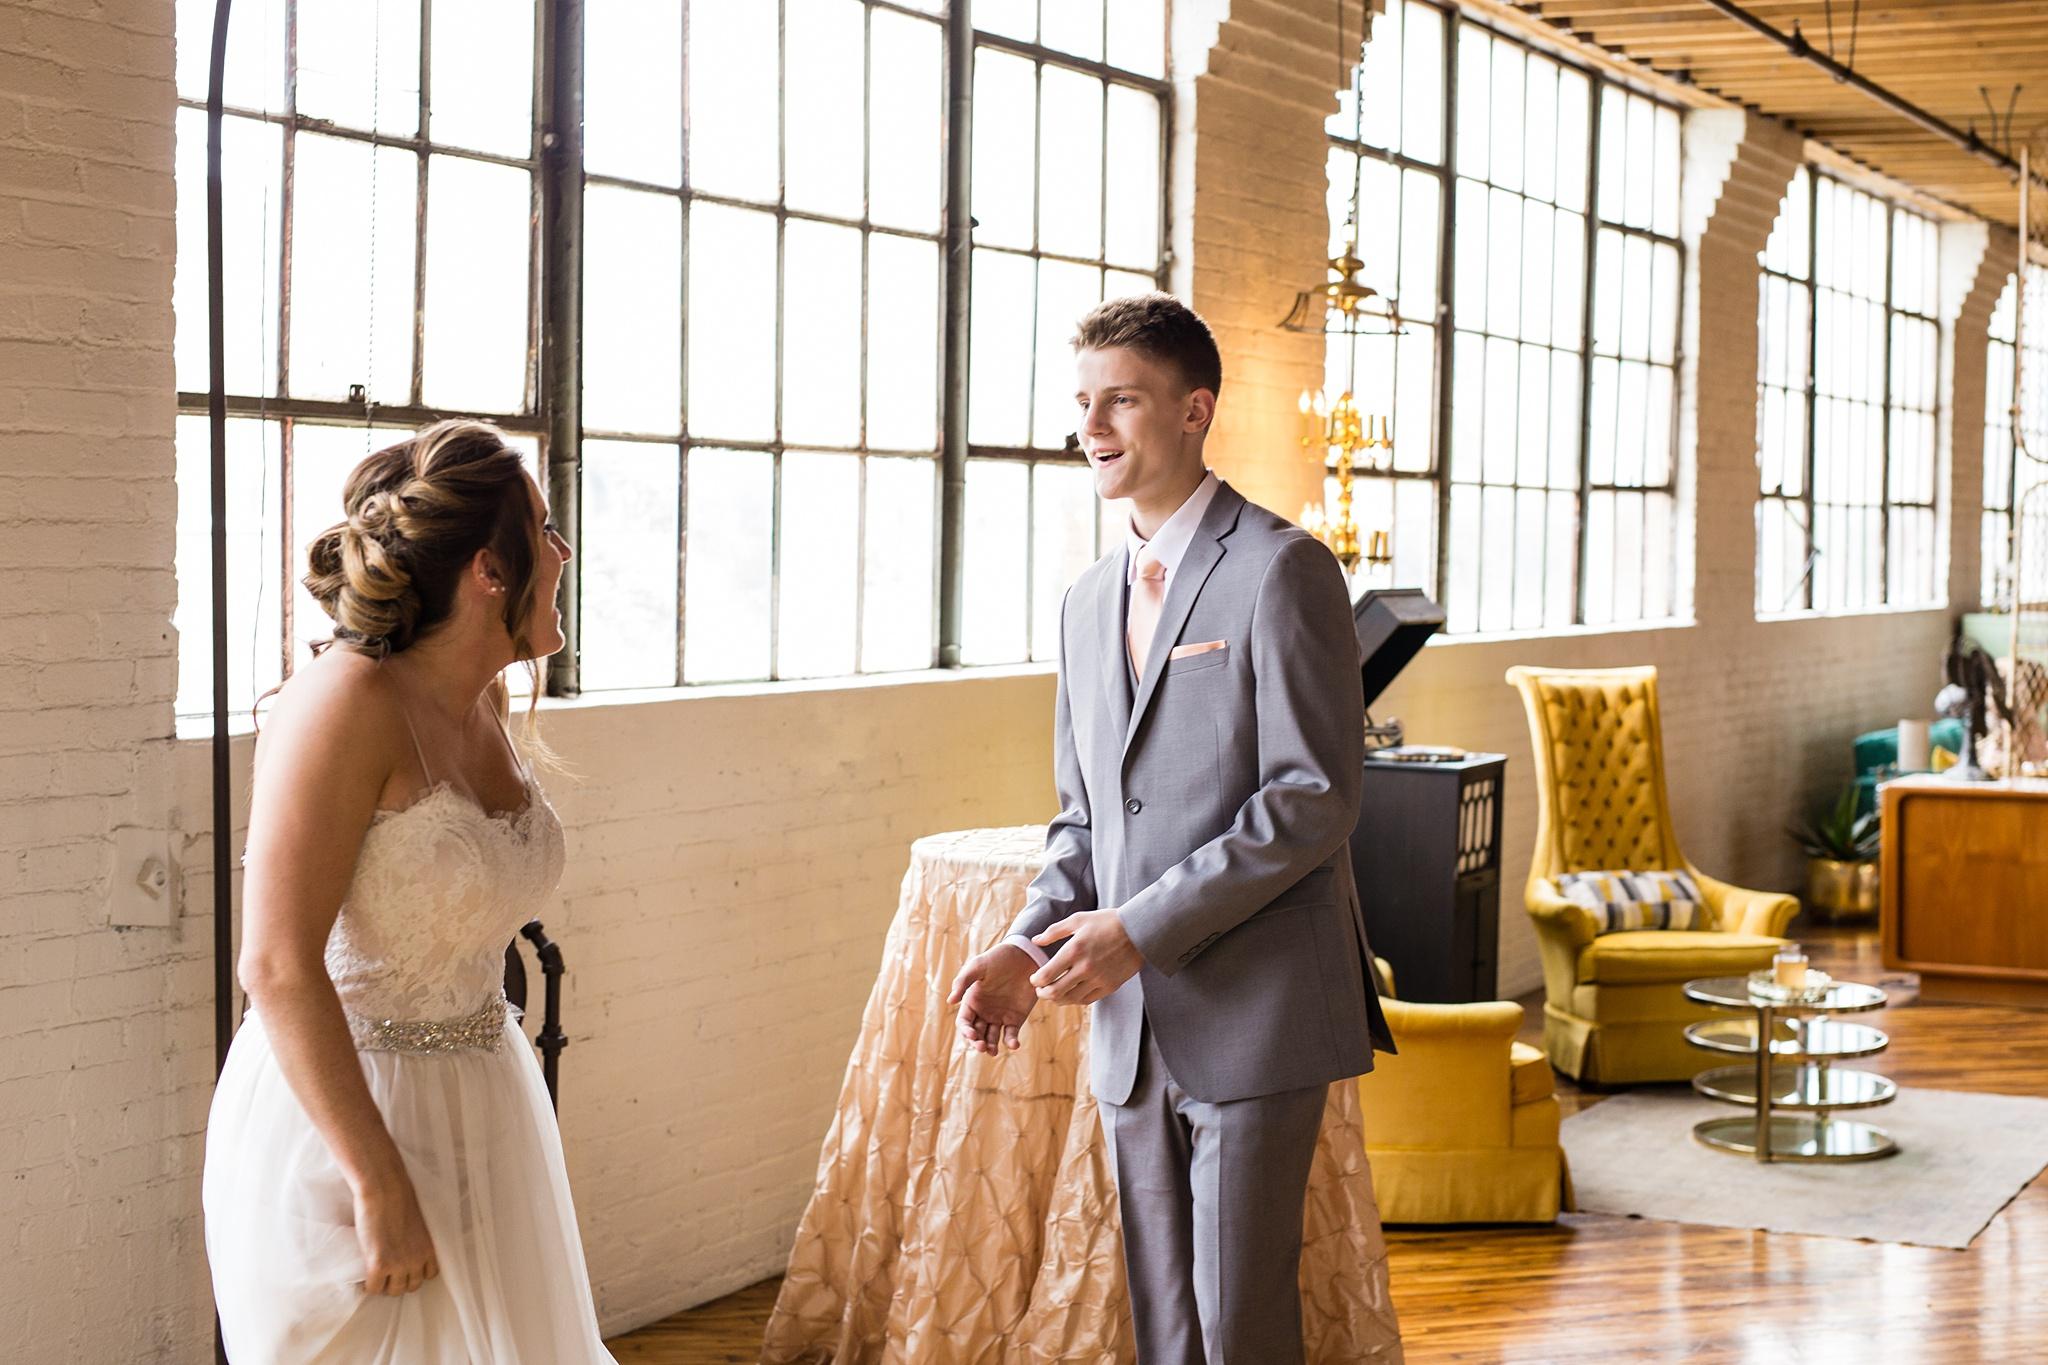 Meghan_Drew_Grand_Rapids_Cheney_place_Wedding022.JPG